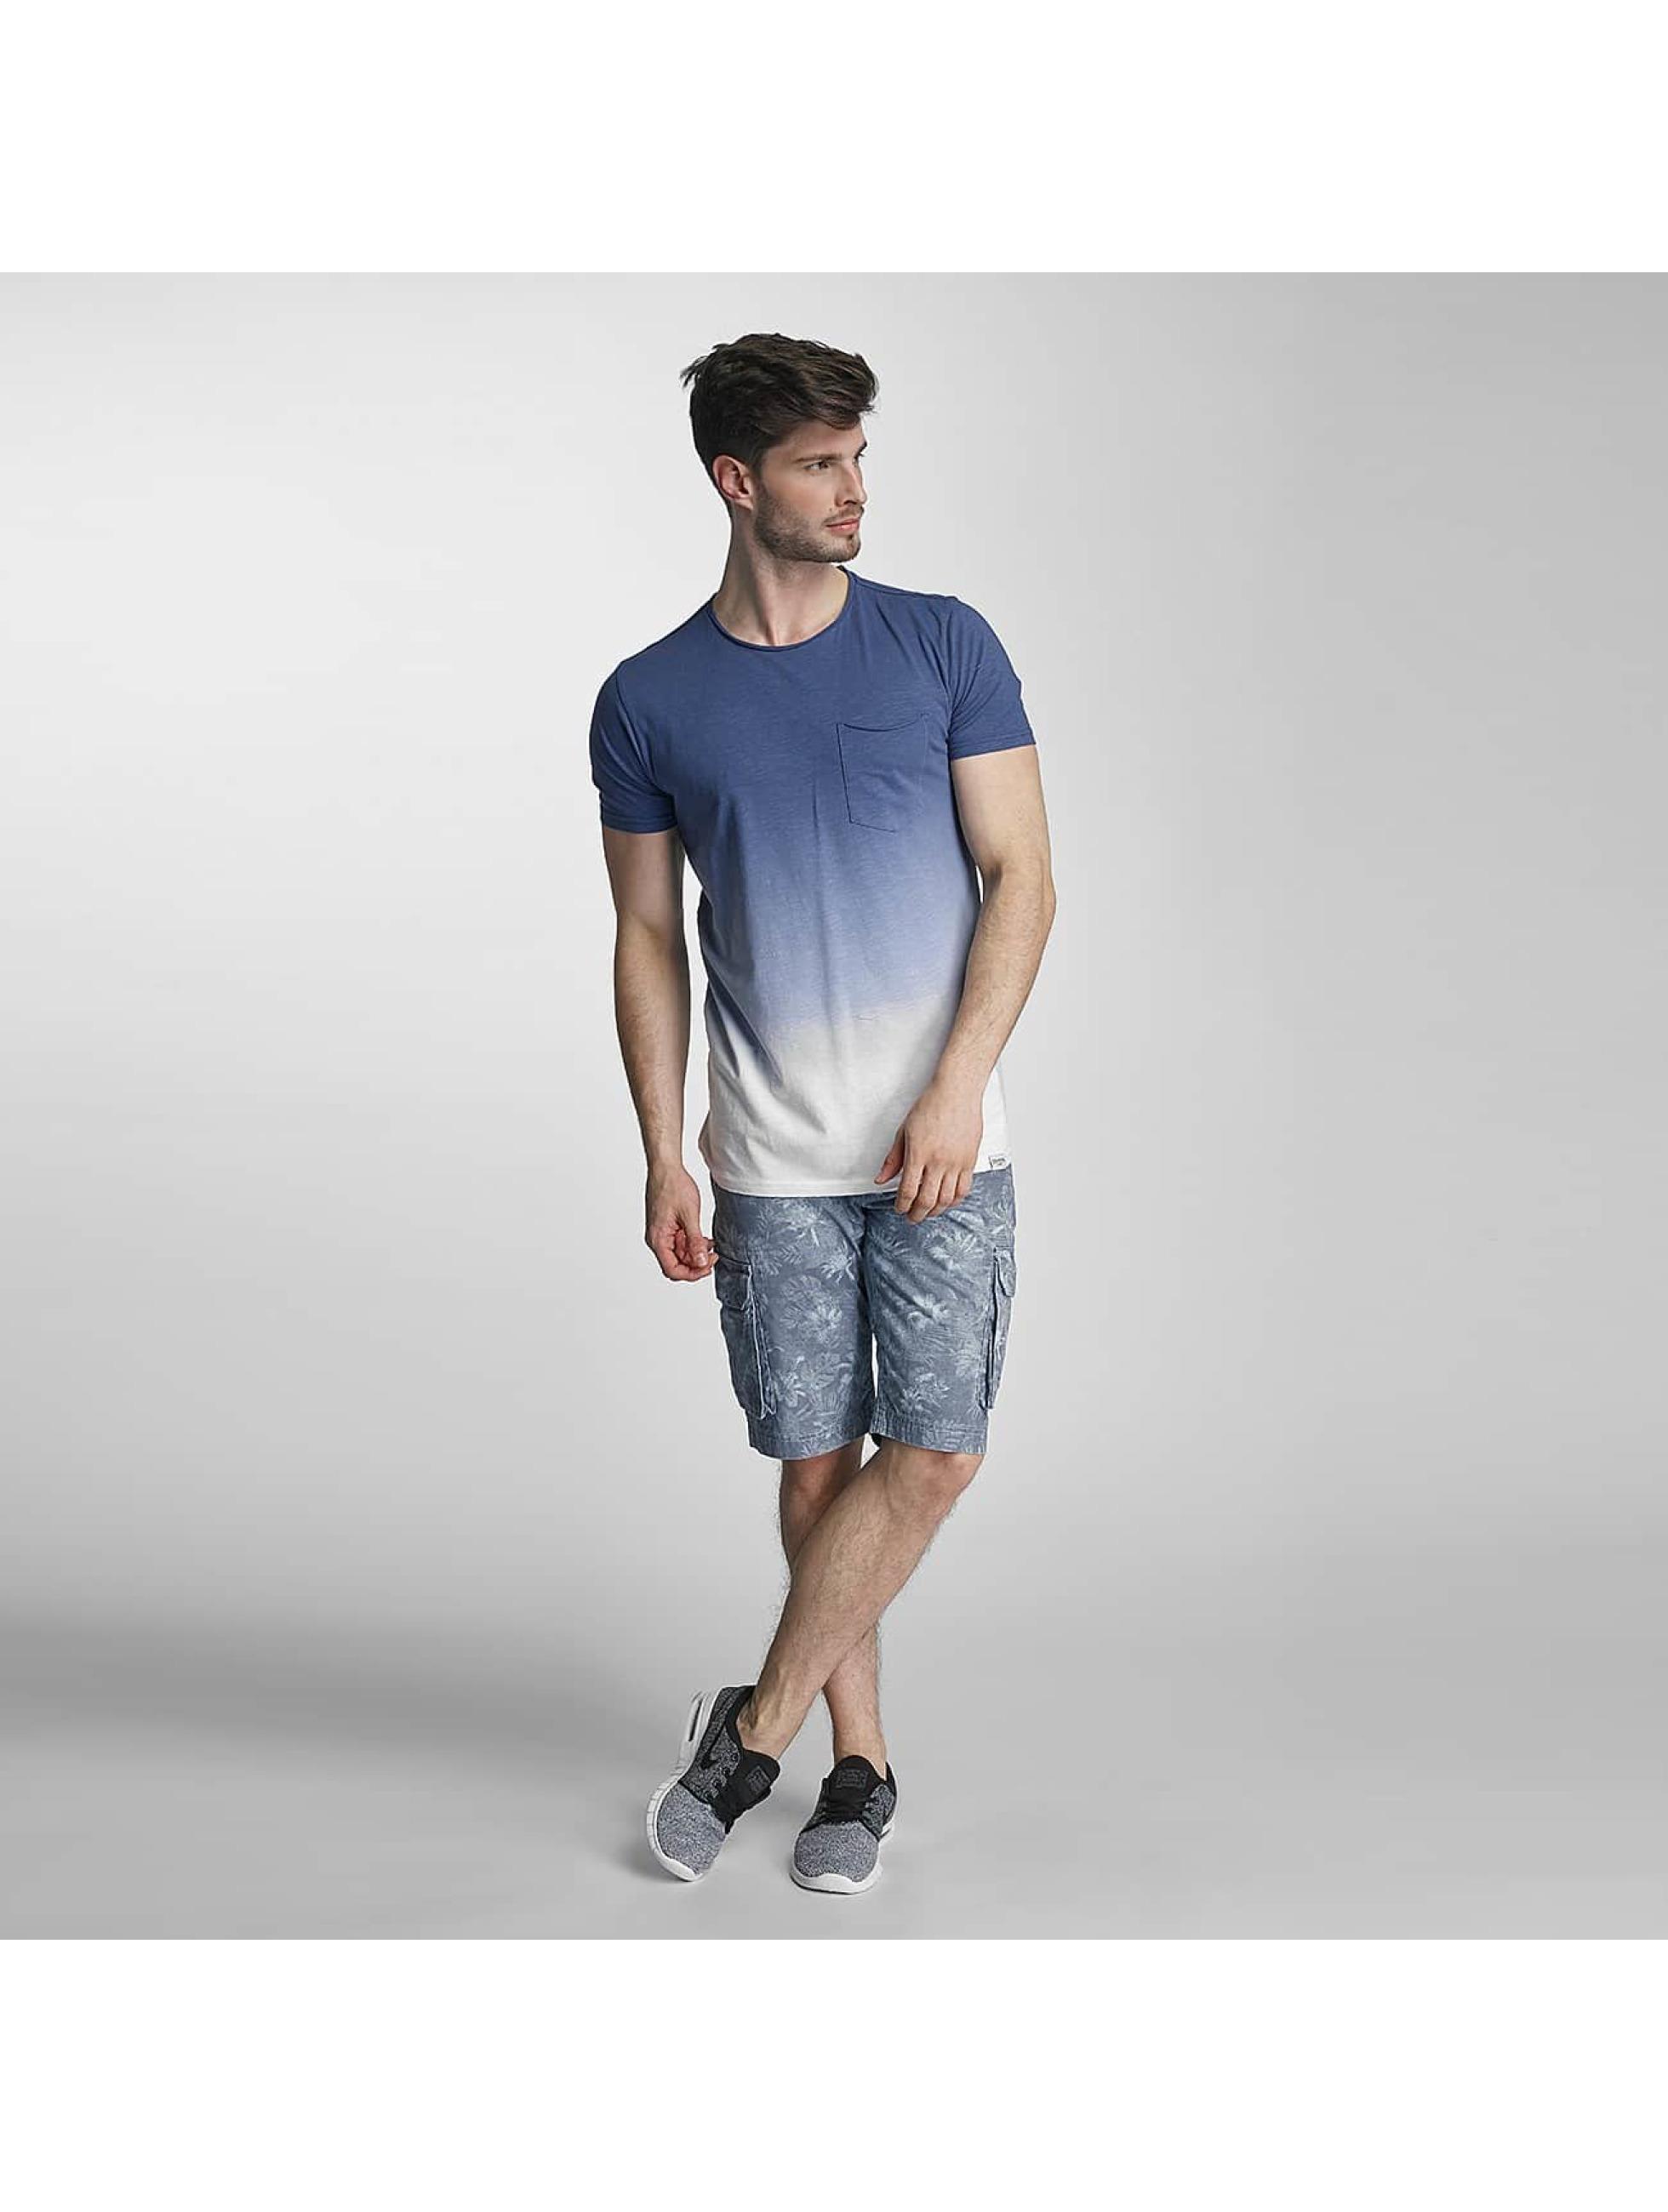 SHINE Original T-Shirt Dip Dyed blau